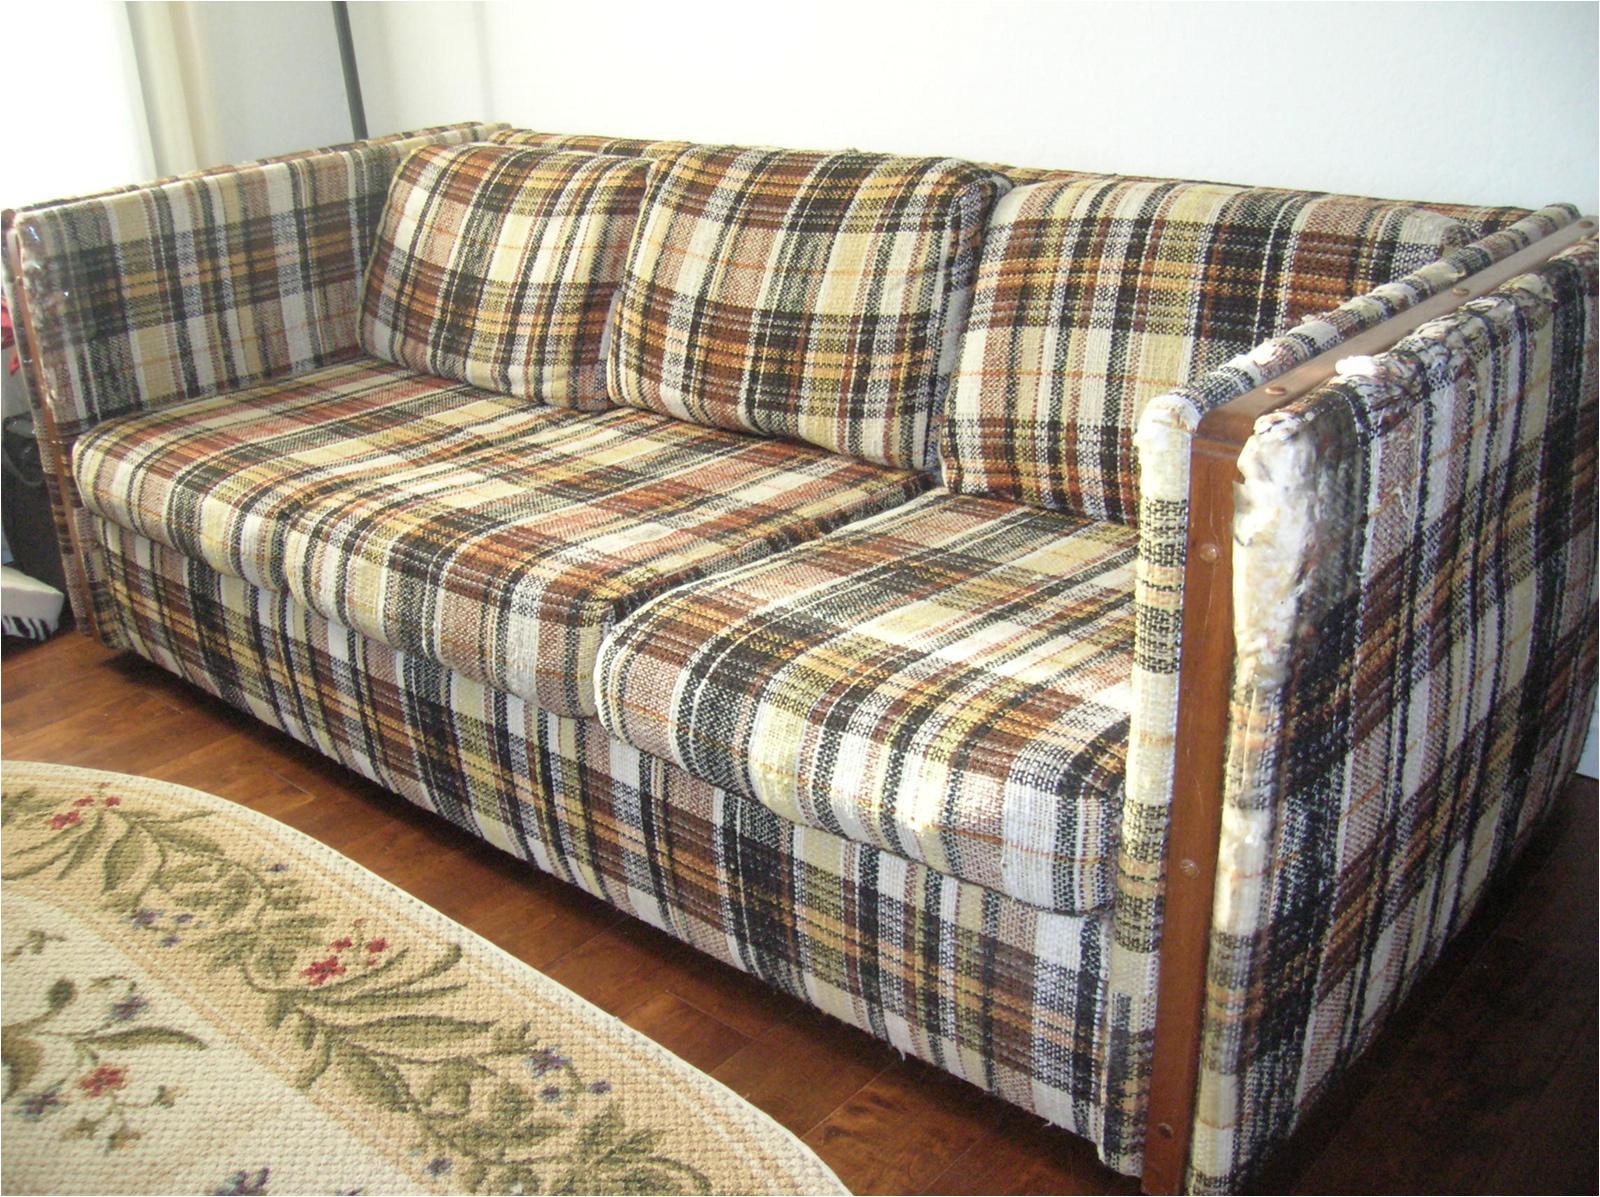 Office Furniture Donation Pick Up Sacramento Adinaporter